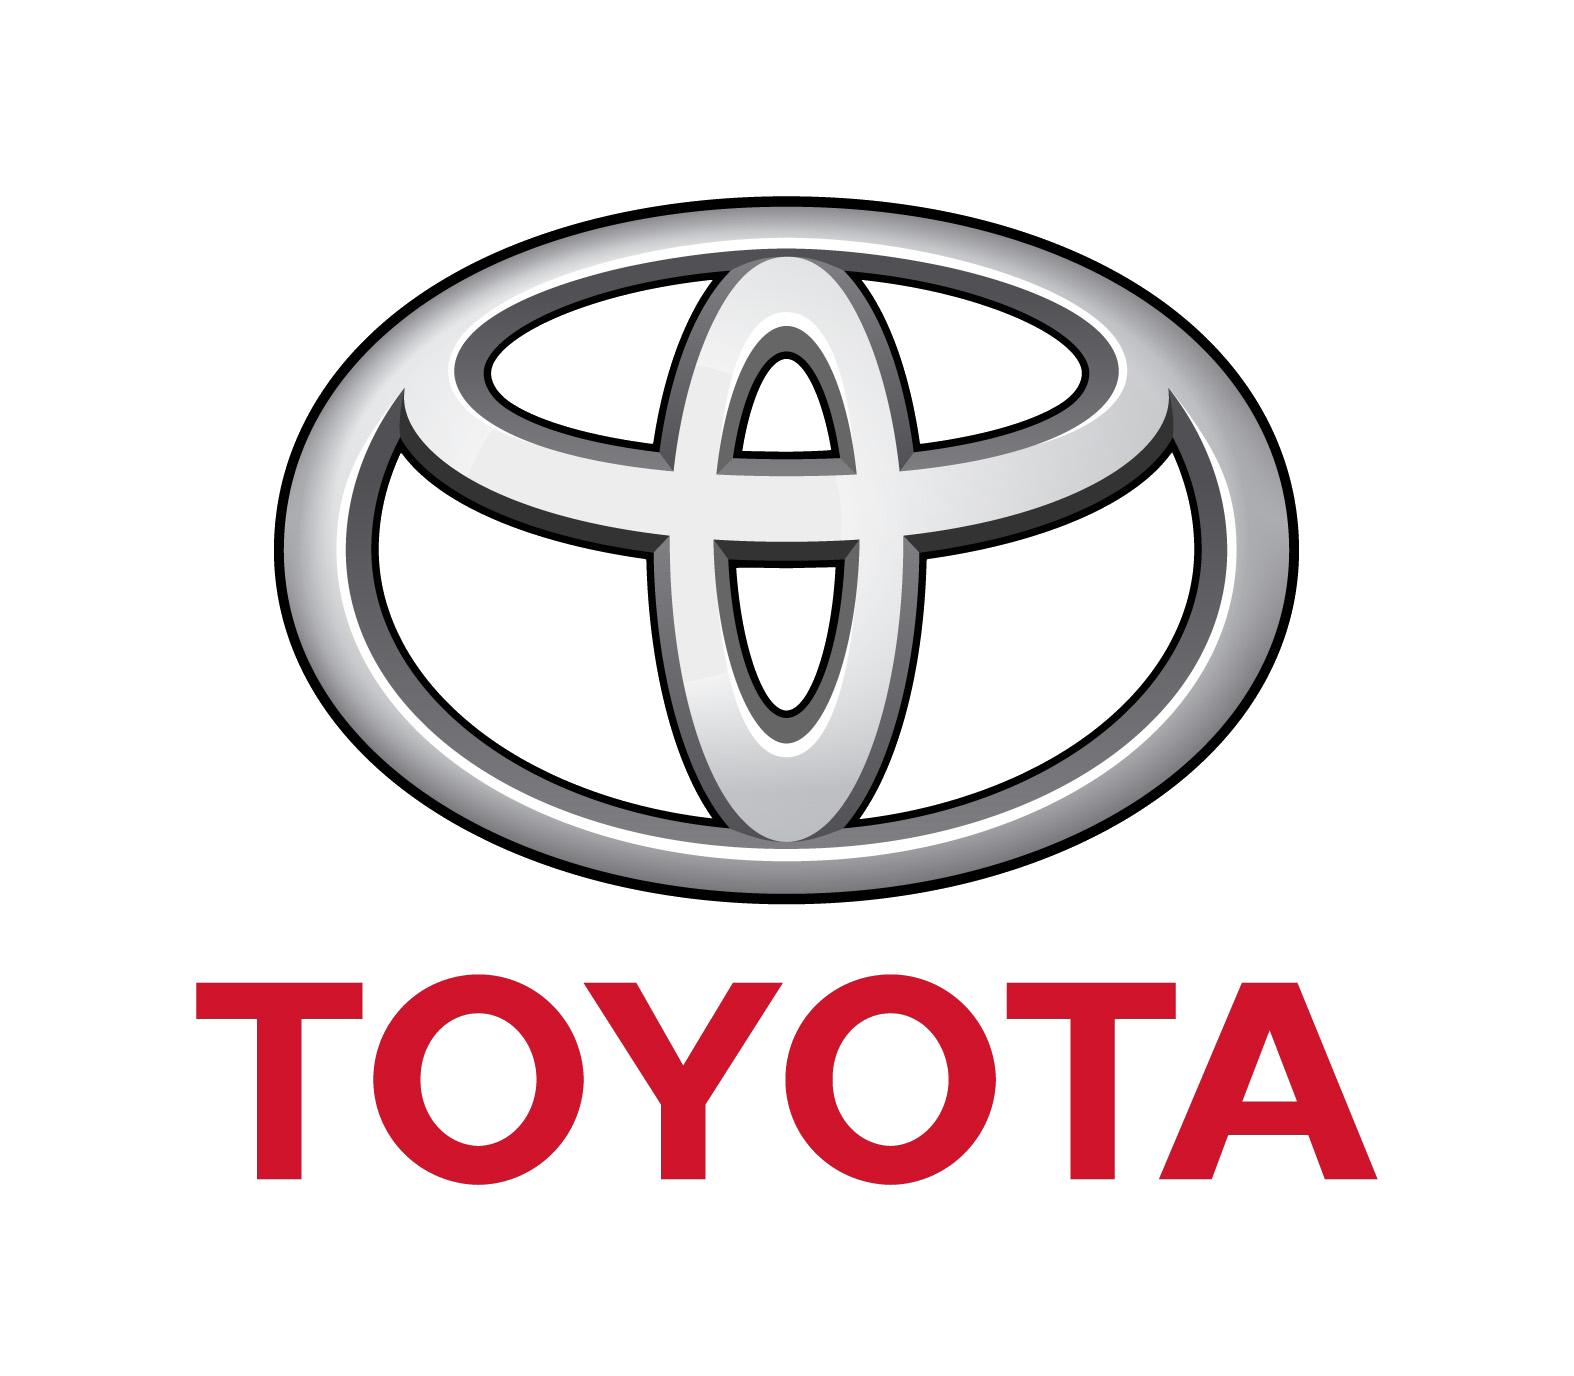 Toyota singapore truck refrigeration servicing